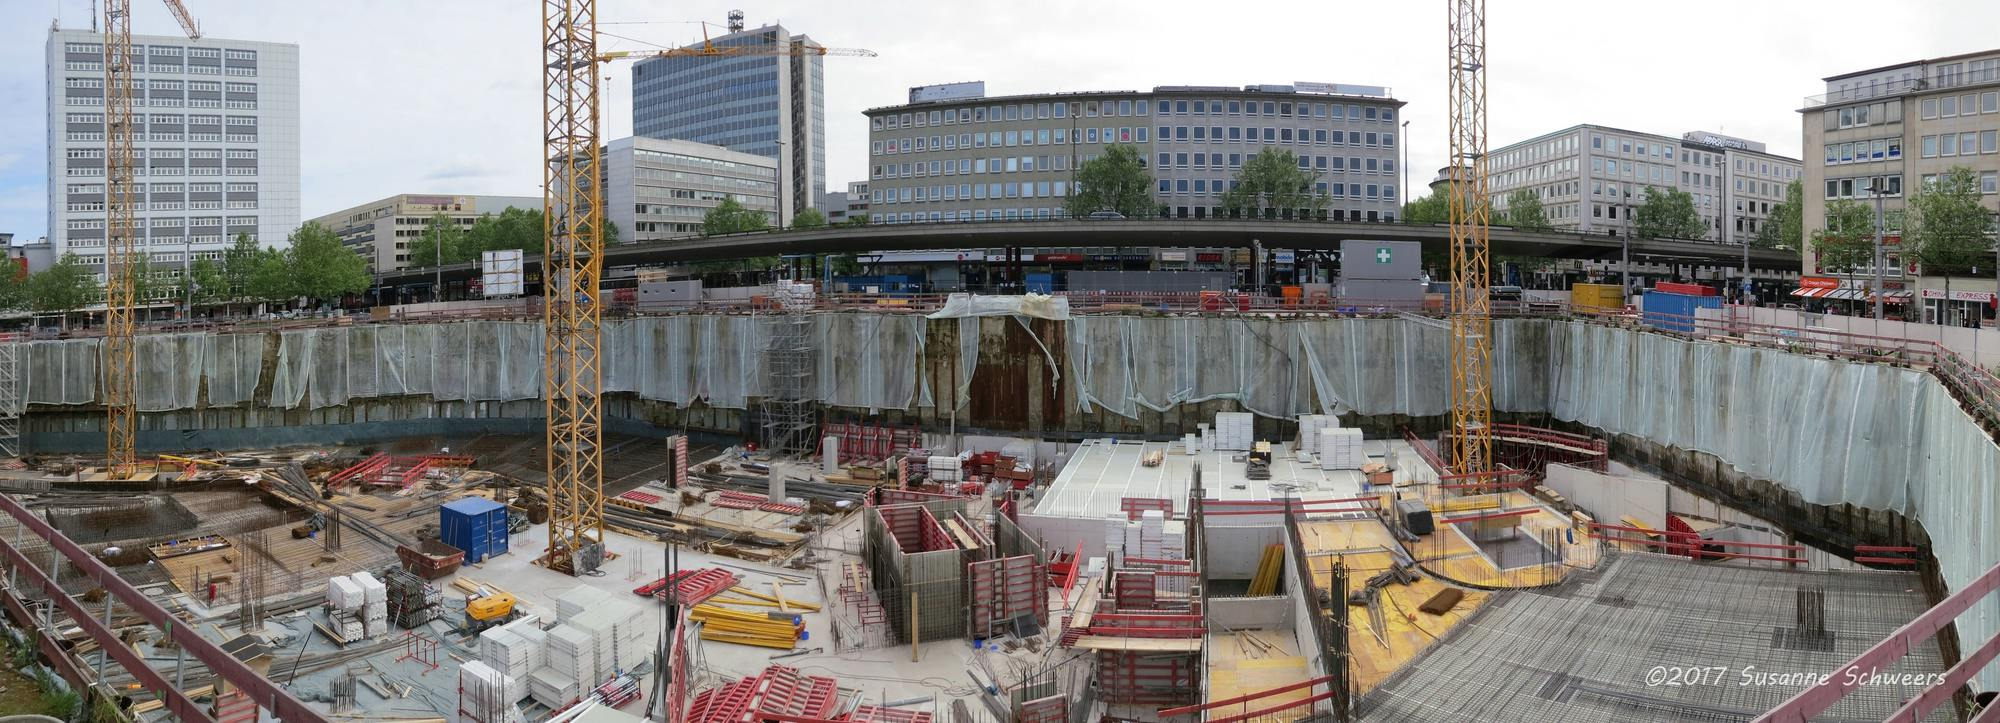 Baustelle Bahnhofsplatz 119